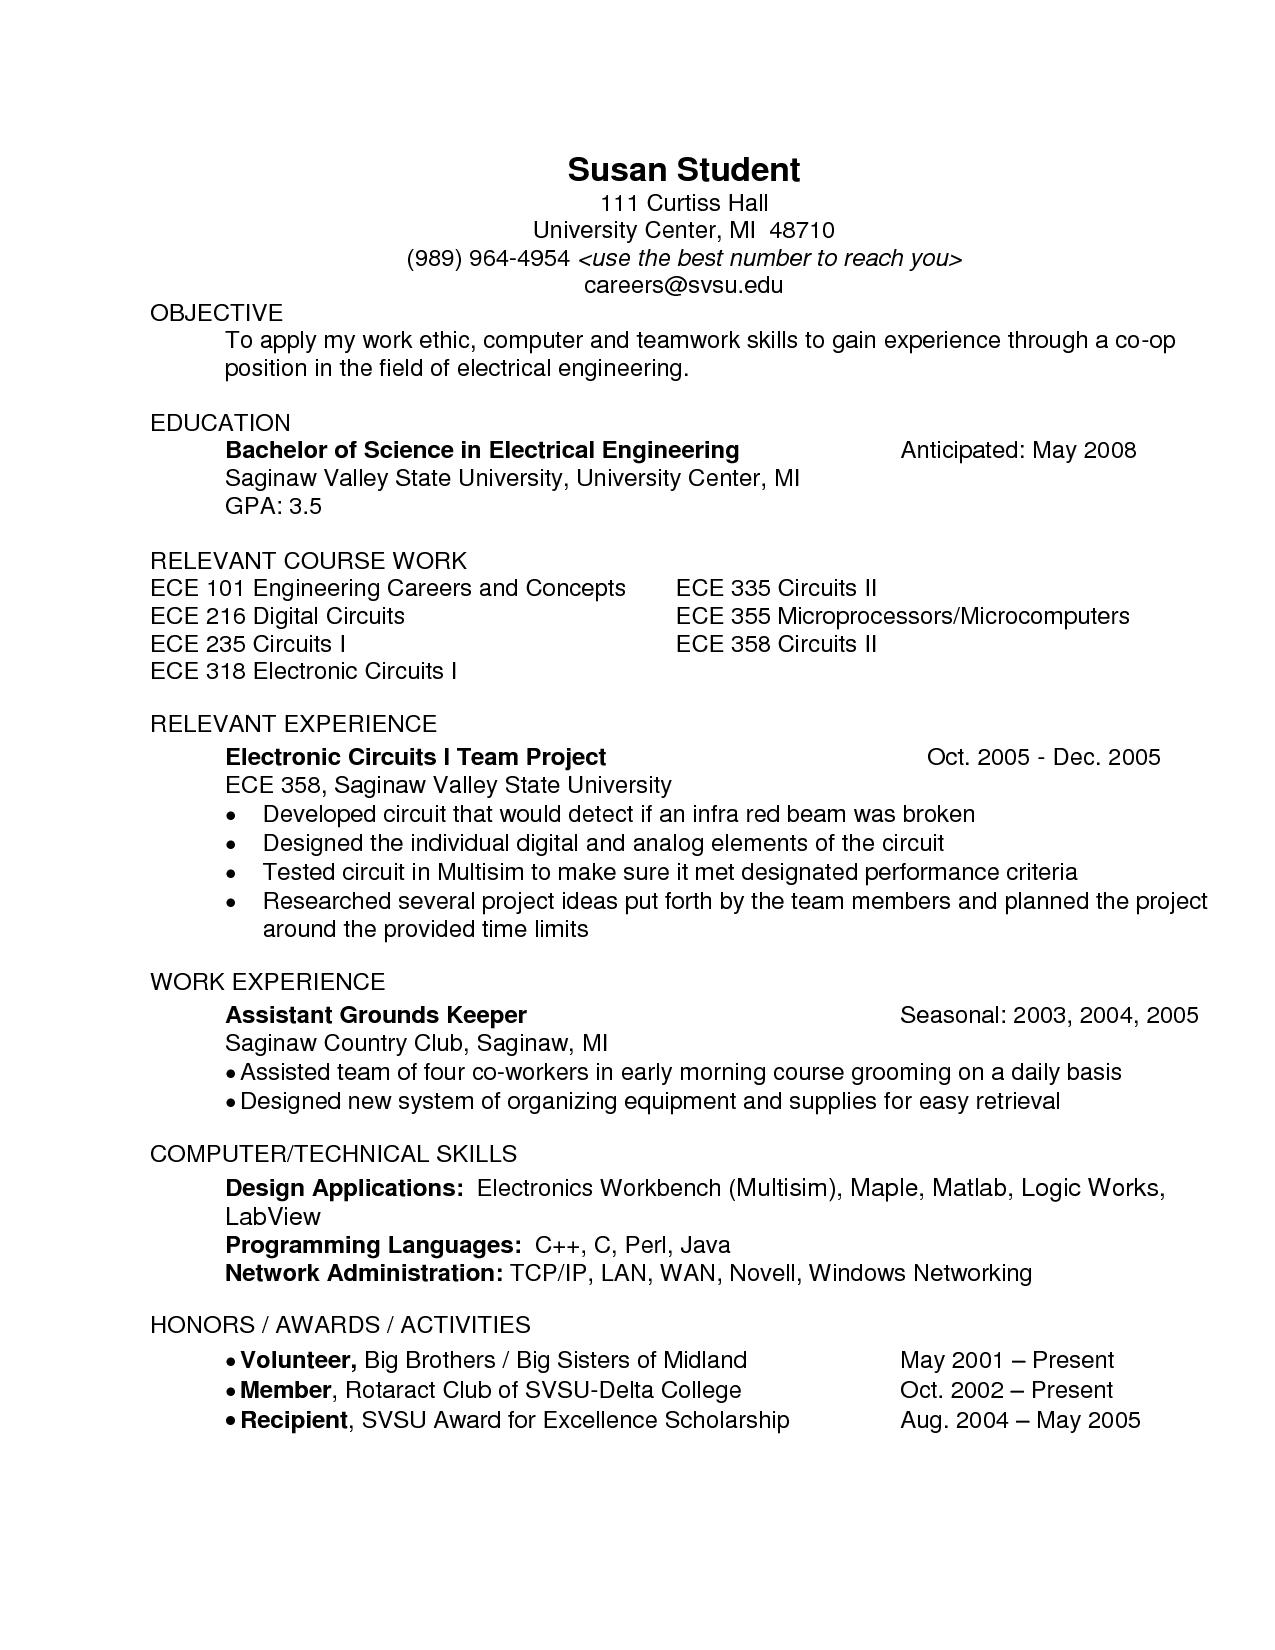 B E Ece Resume Format Engineering Resume Education Resume Resume Format